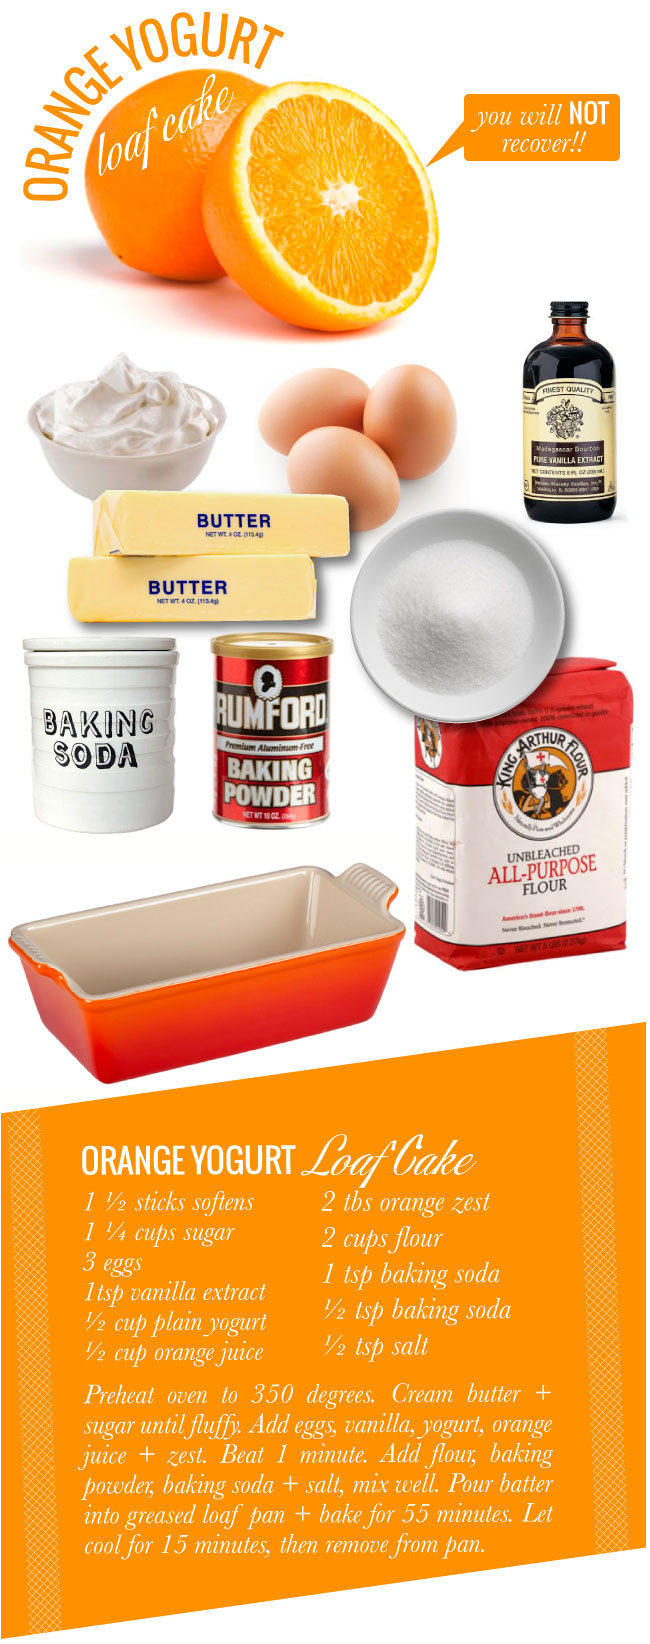 Orange-Yogurt-Loaf-Care.jpg